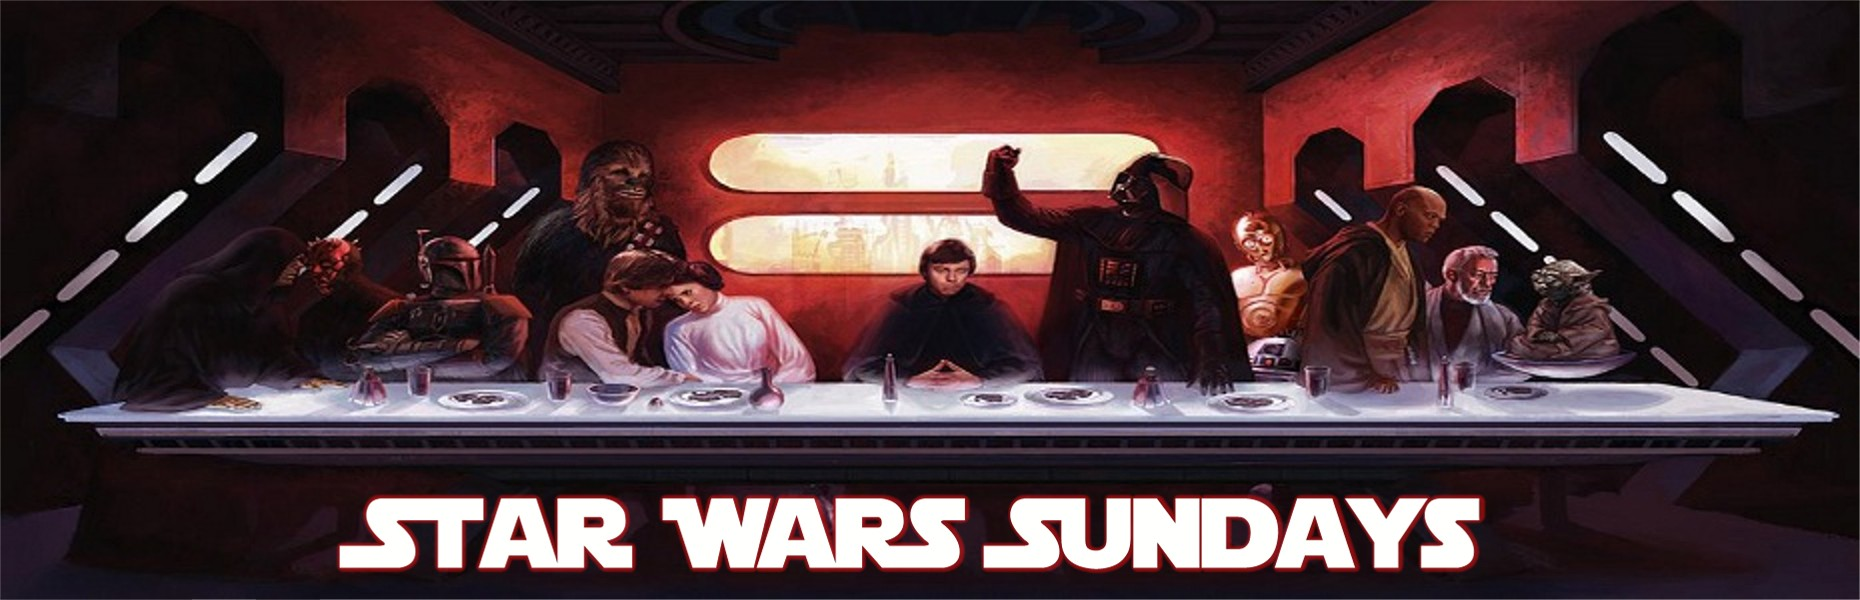 Star Wars Sundays: J.J. Abrams talks Star Wars Episode 7